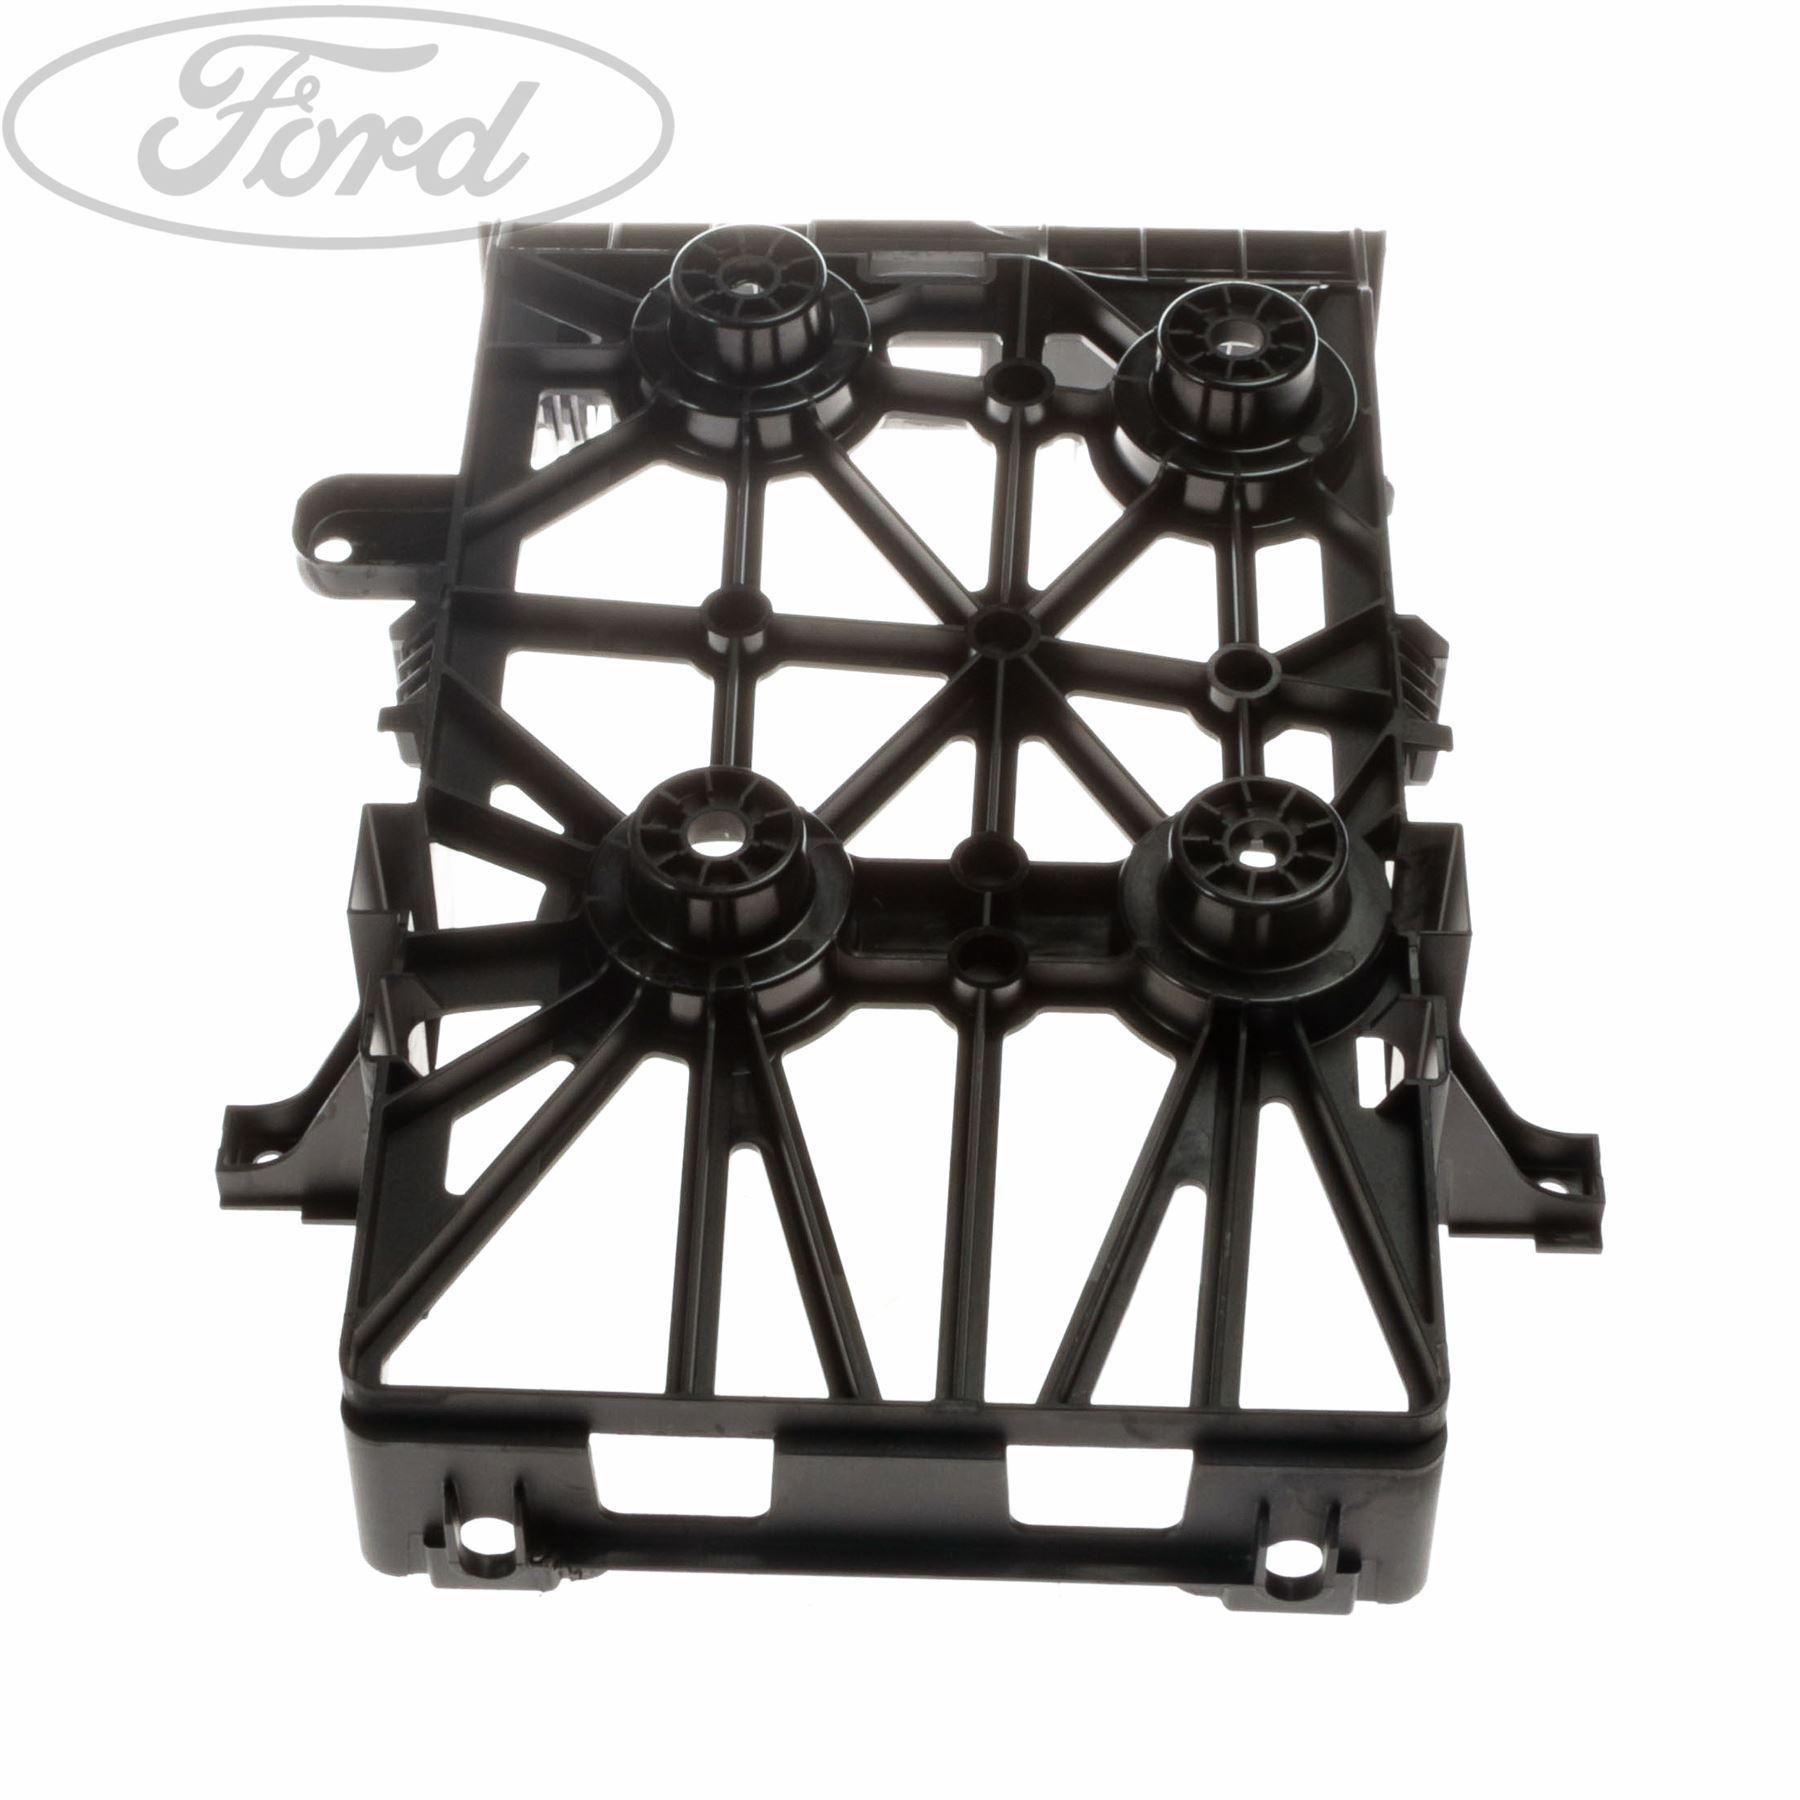 Genuine Ford Transit MK 7 Fuse Box Bracket 1434704